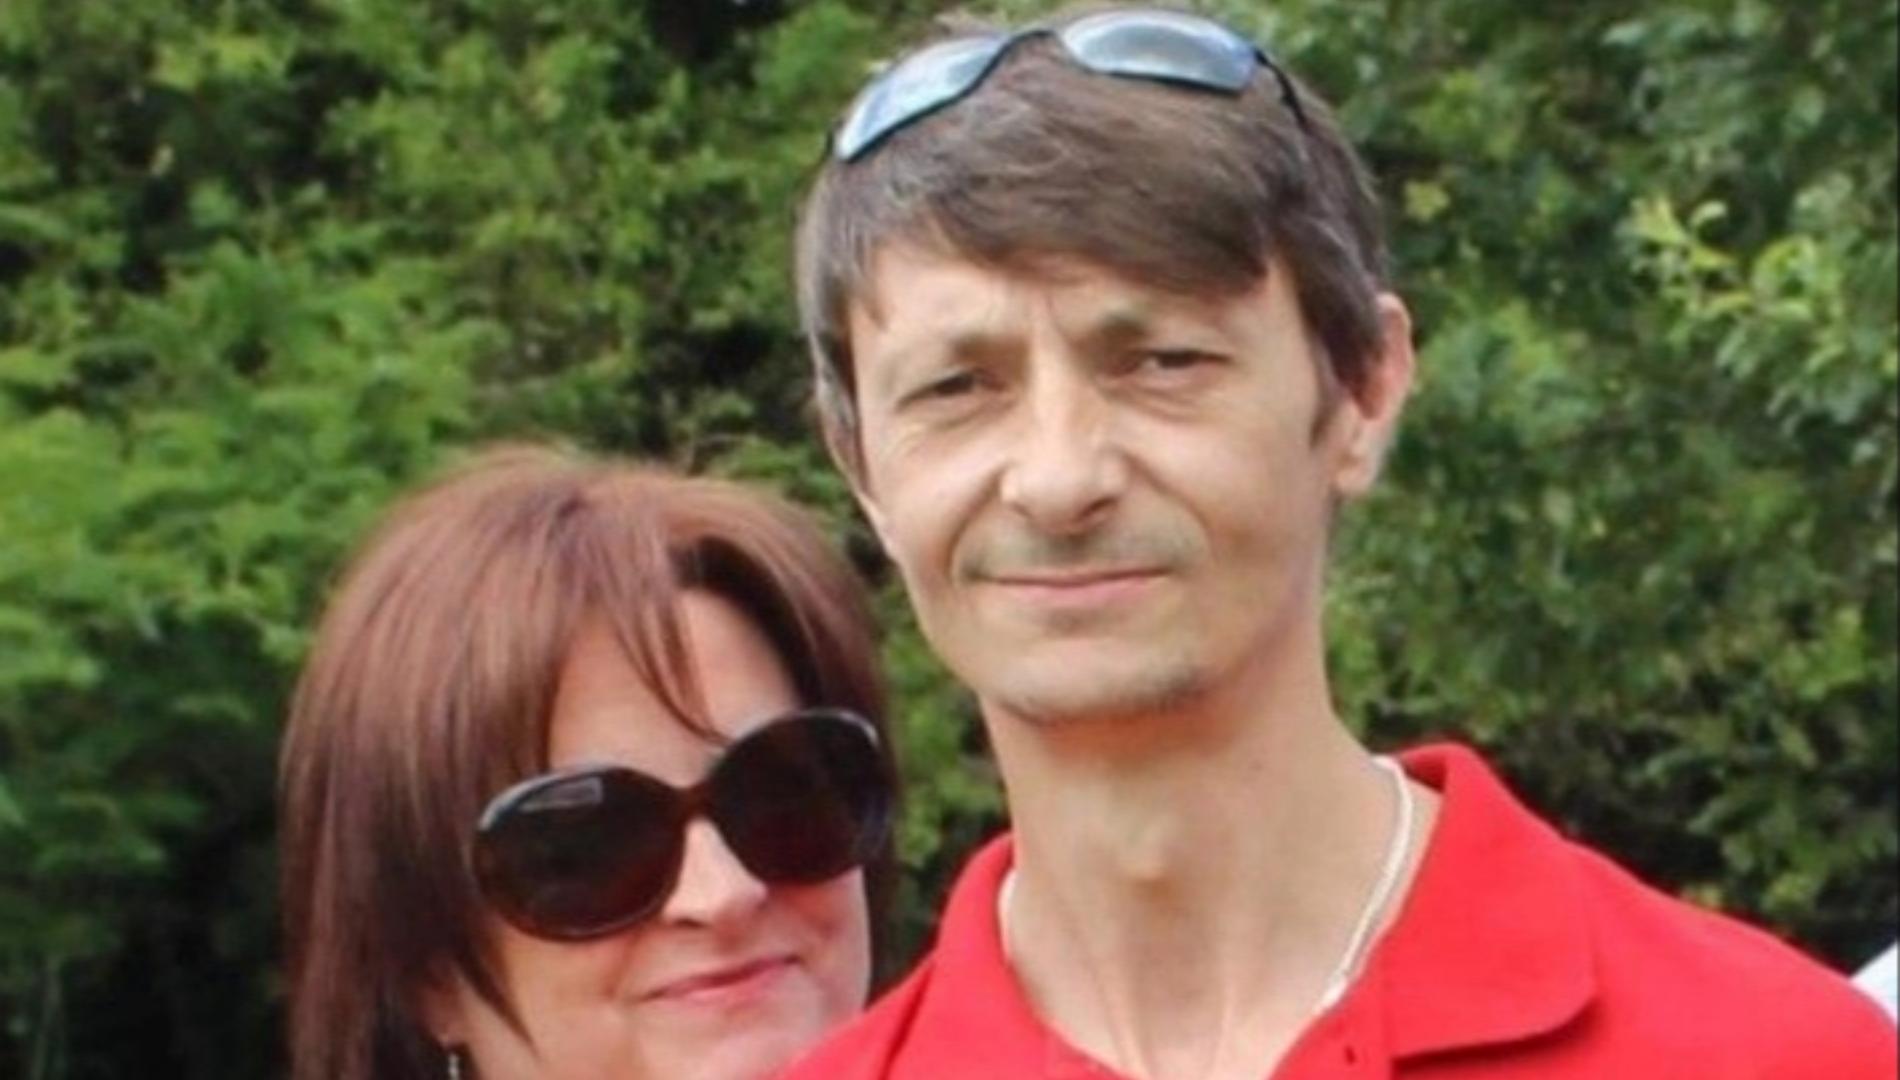 O τραγικός πατέρας Άλαν Γουίλσον με τη σύζυγό του Άννι